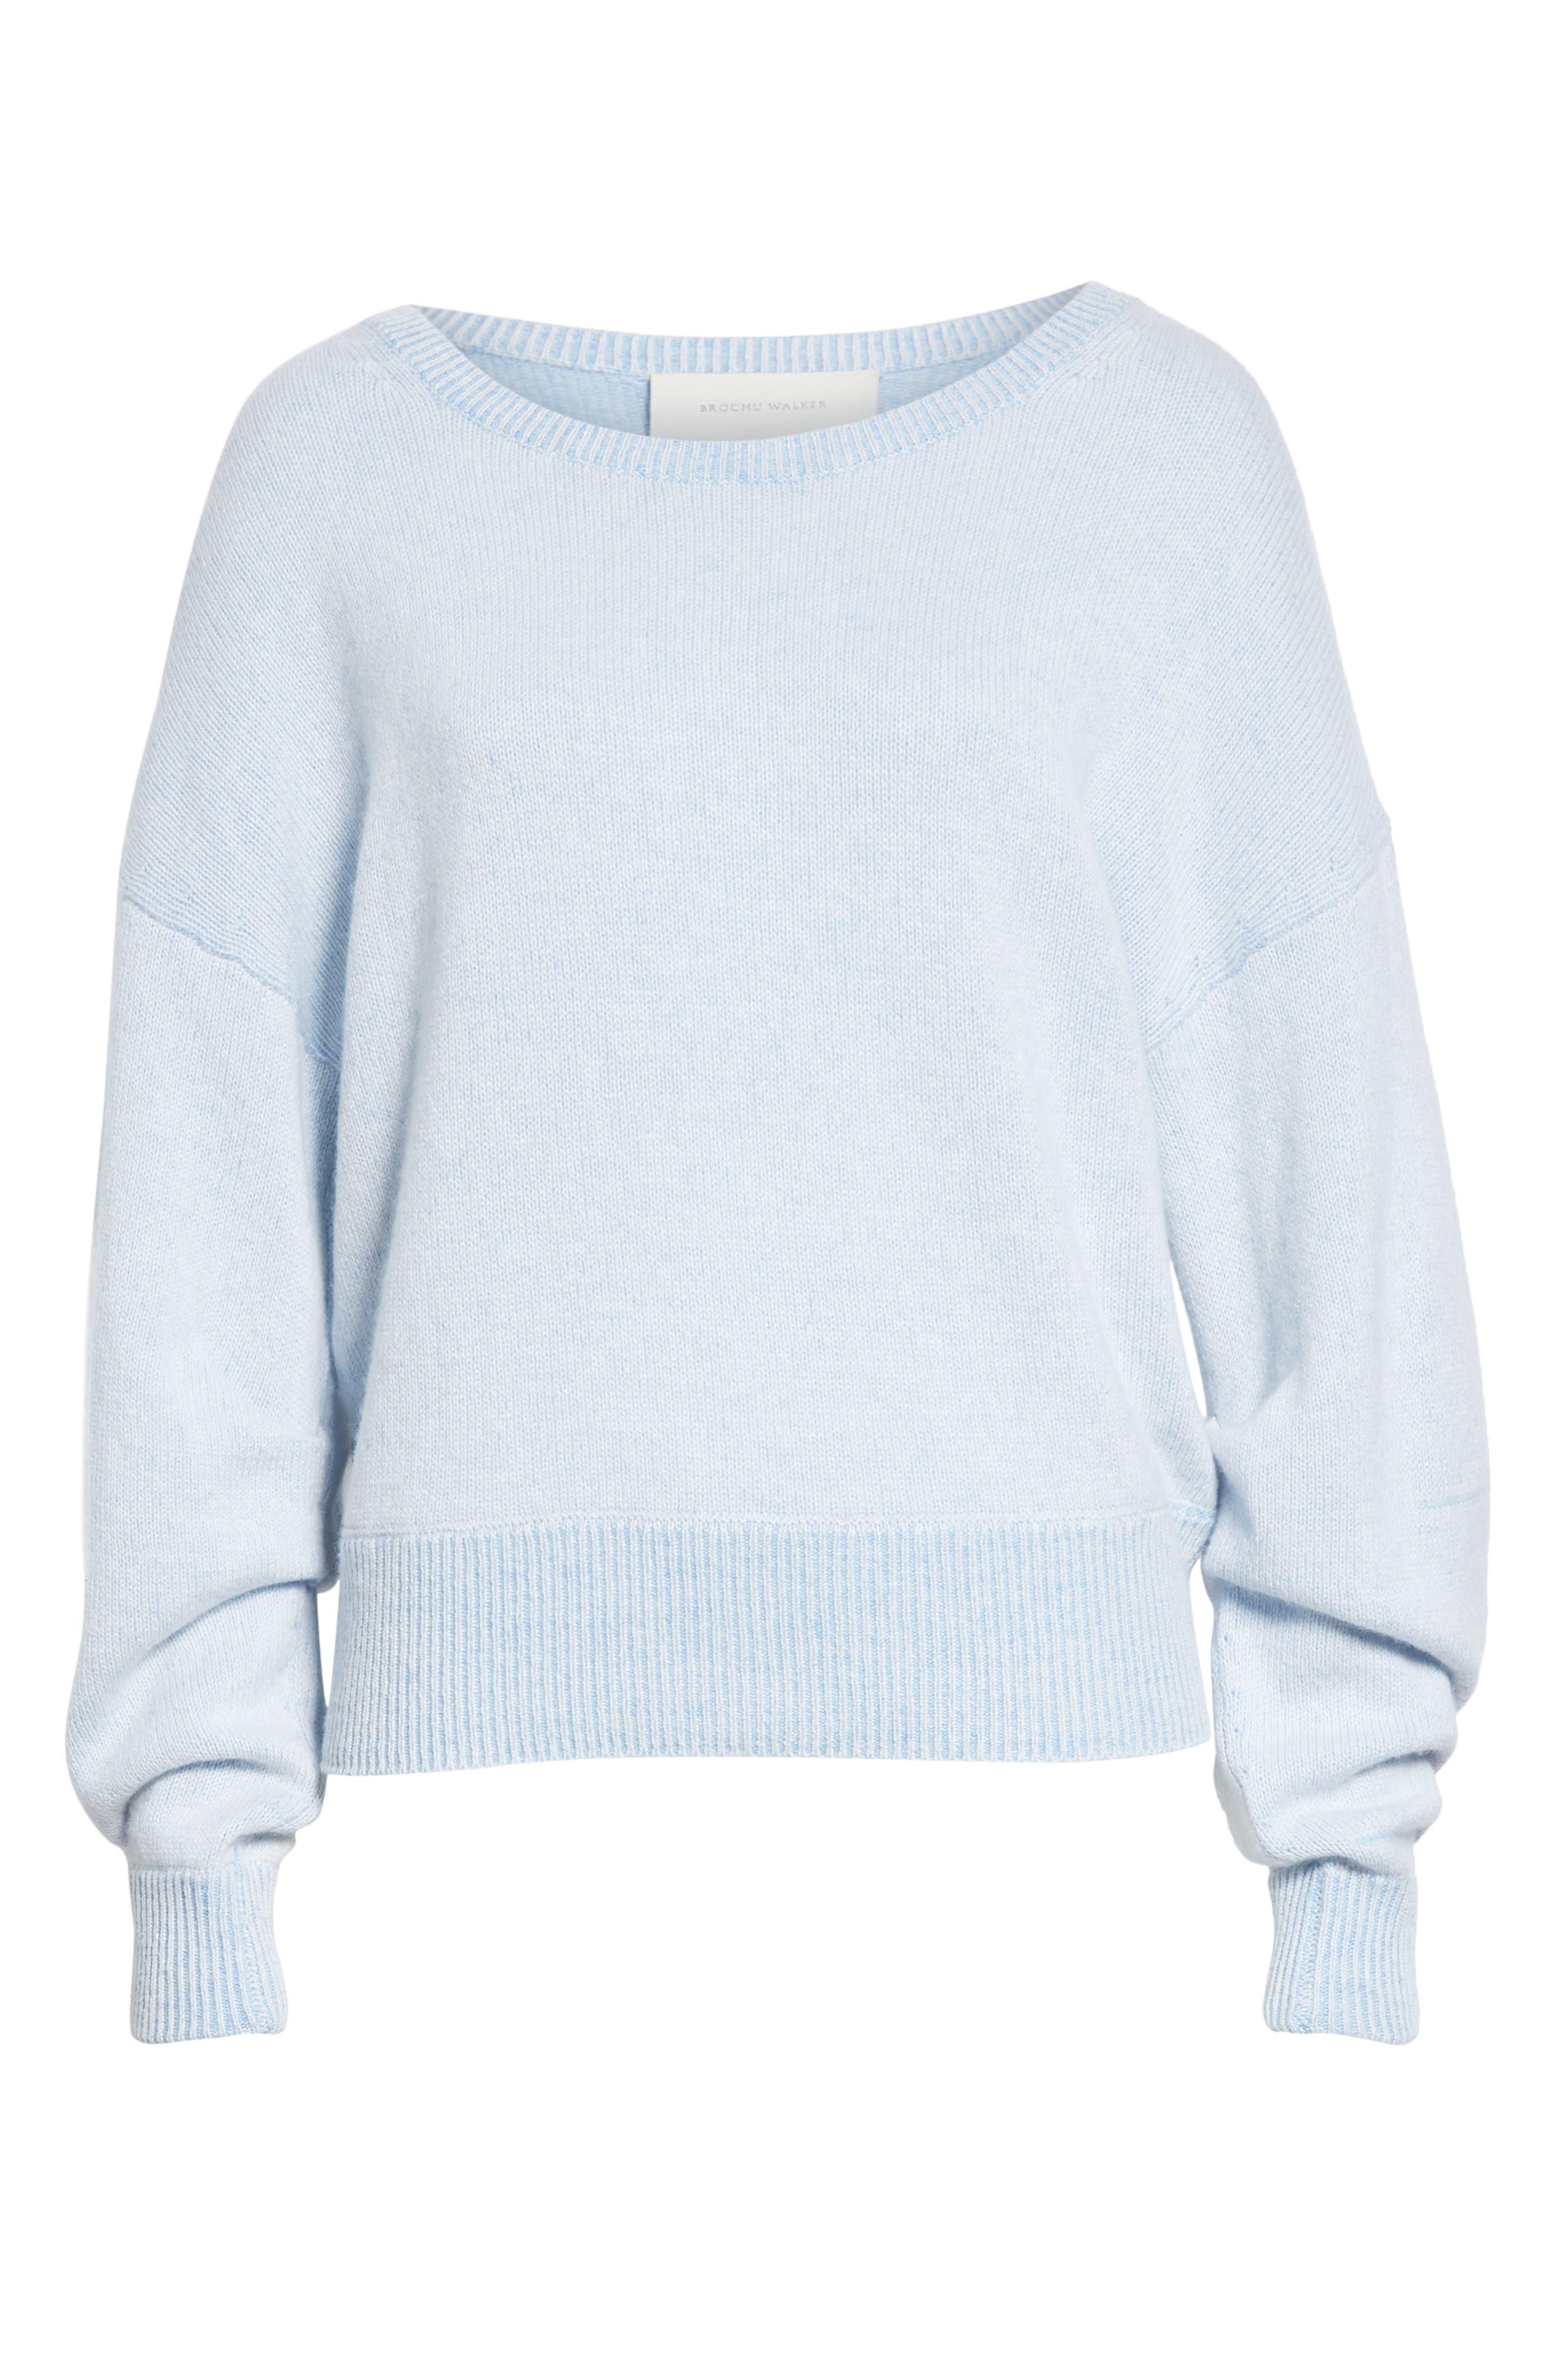 Alta Cashmere Sweater,                             Alternate thumbnail 6, color,                             SKYLAR BLUE COMBO